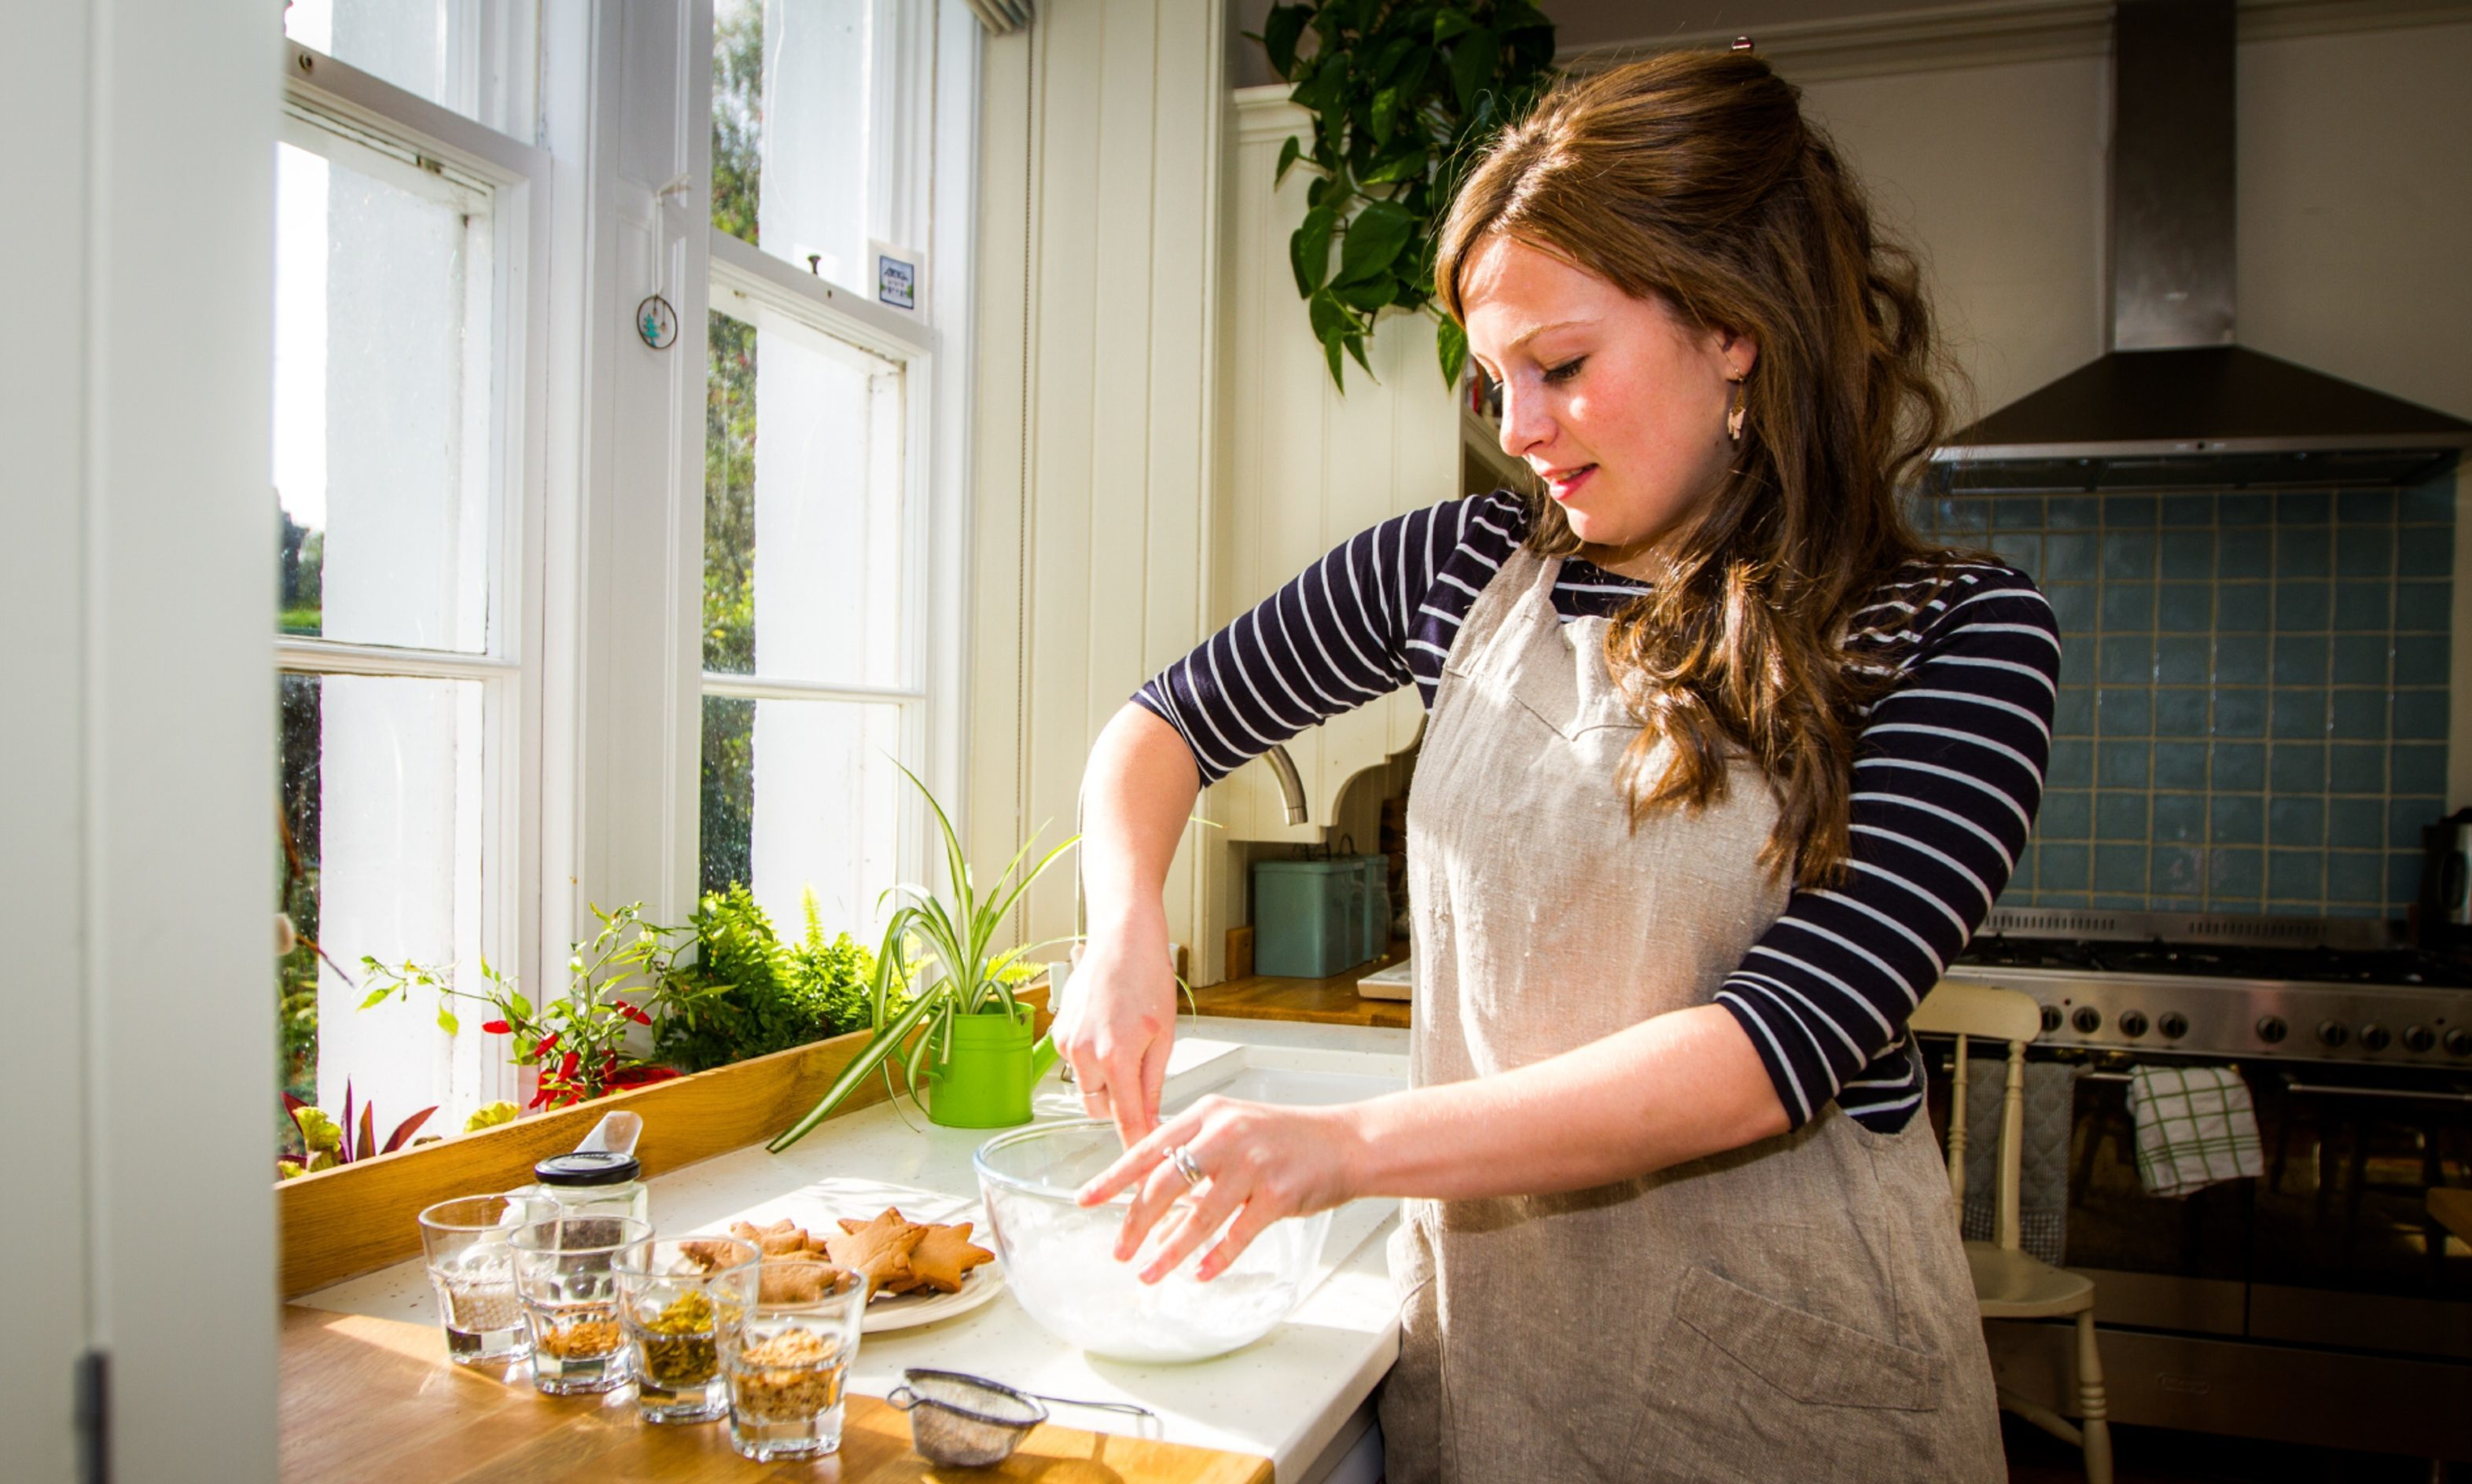 Flora Shedden prepares Christmas treats at home in Dunkeld.